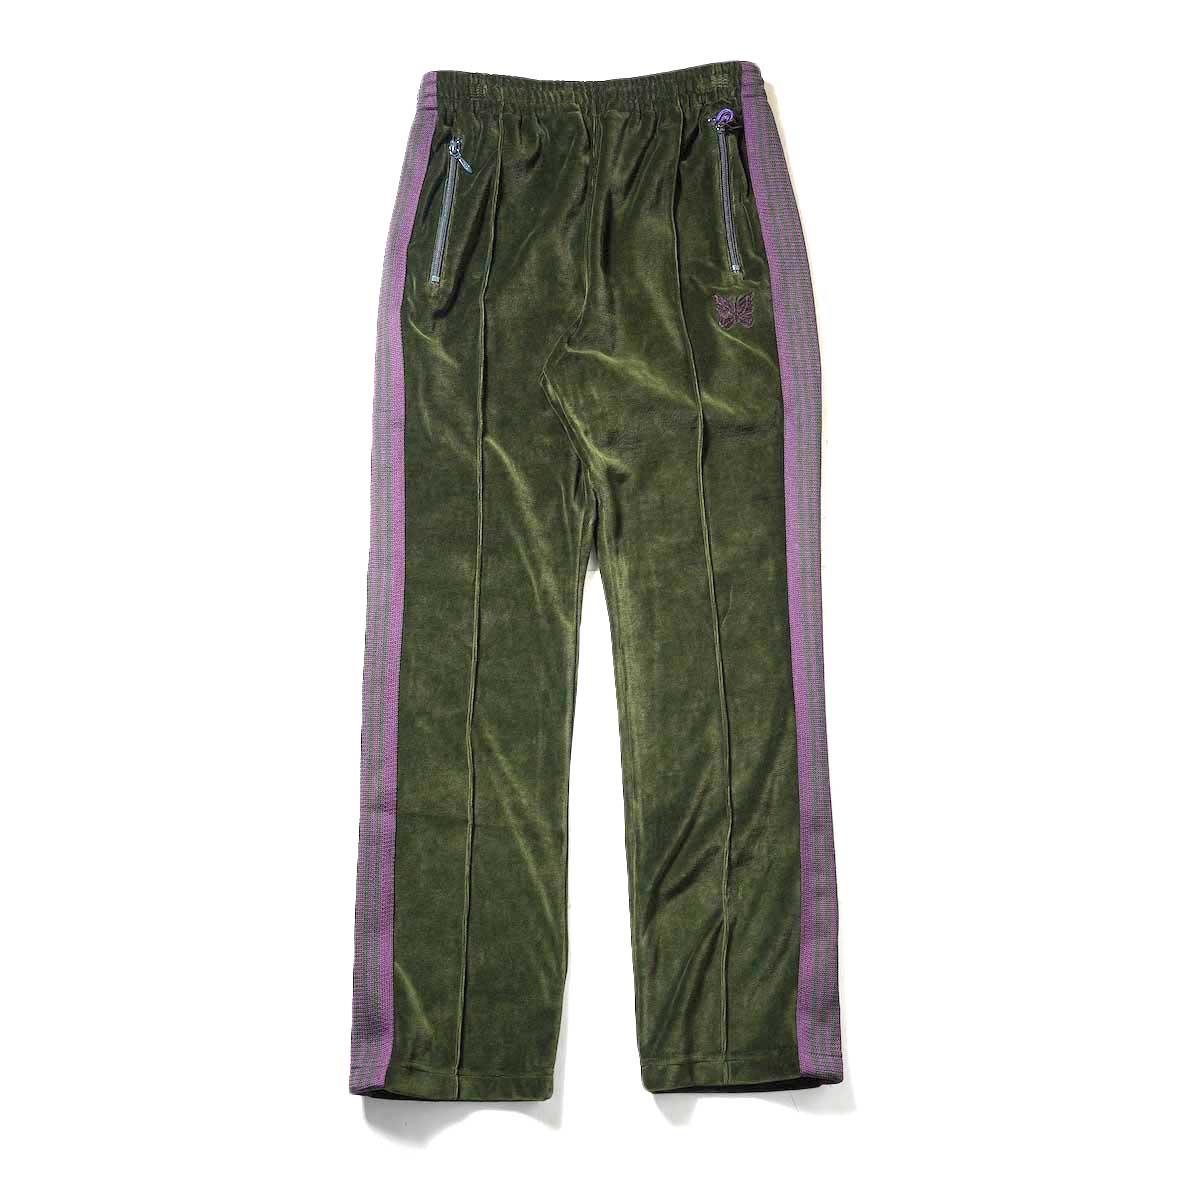 Needles / NARROW TRACK PANT - C/PE VELOUR (Green)正面